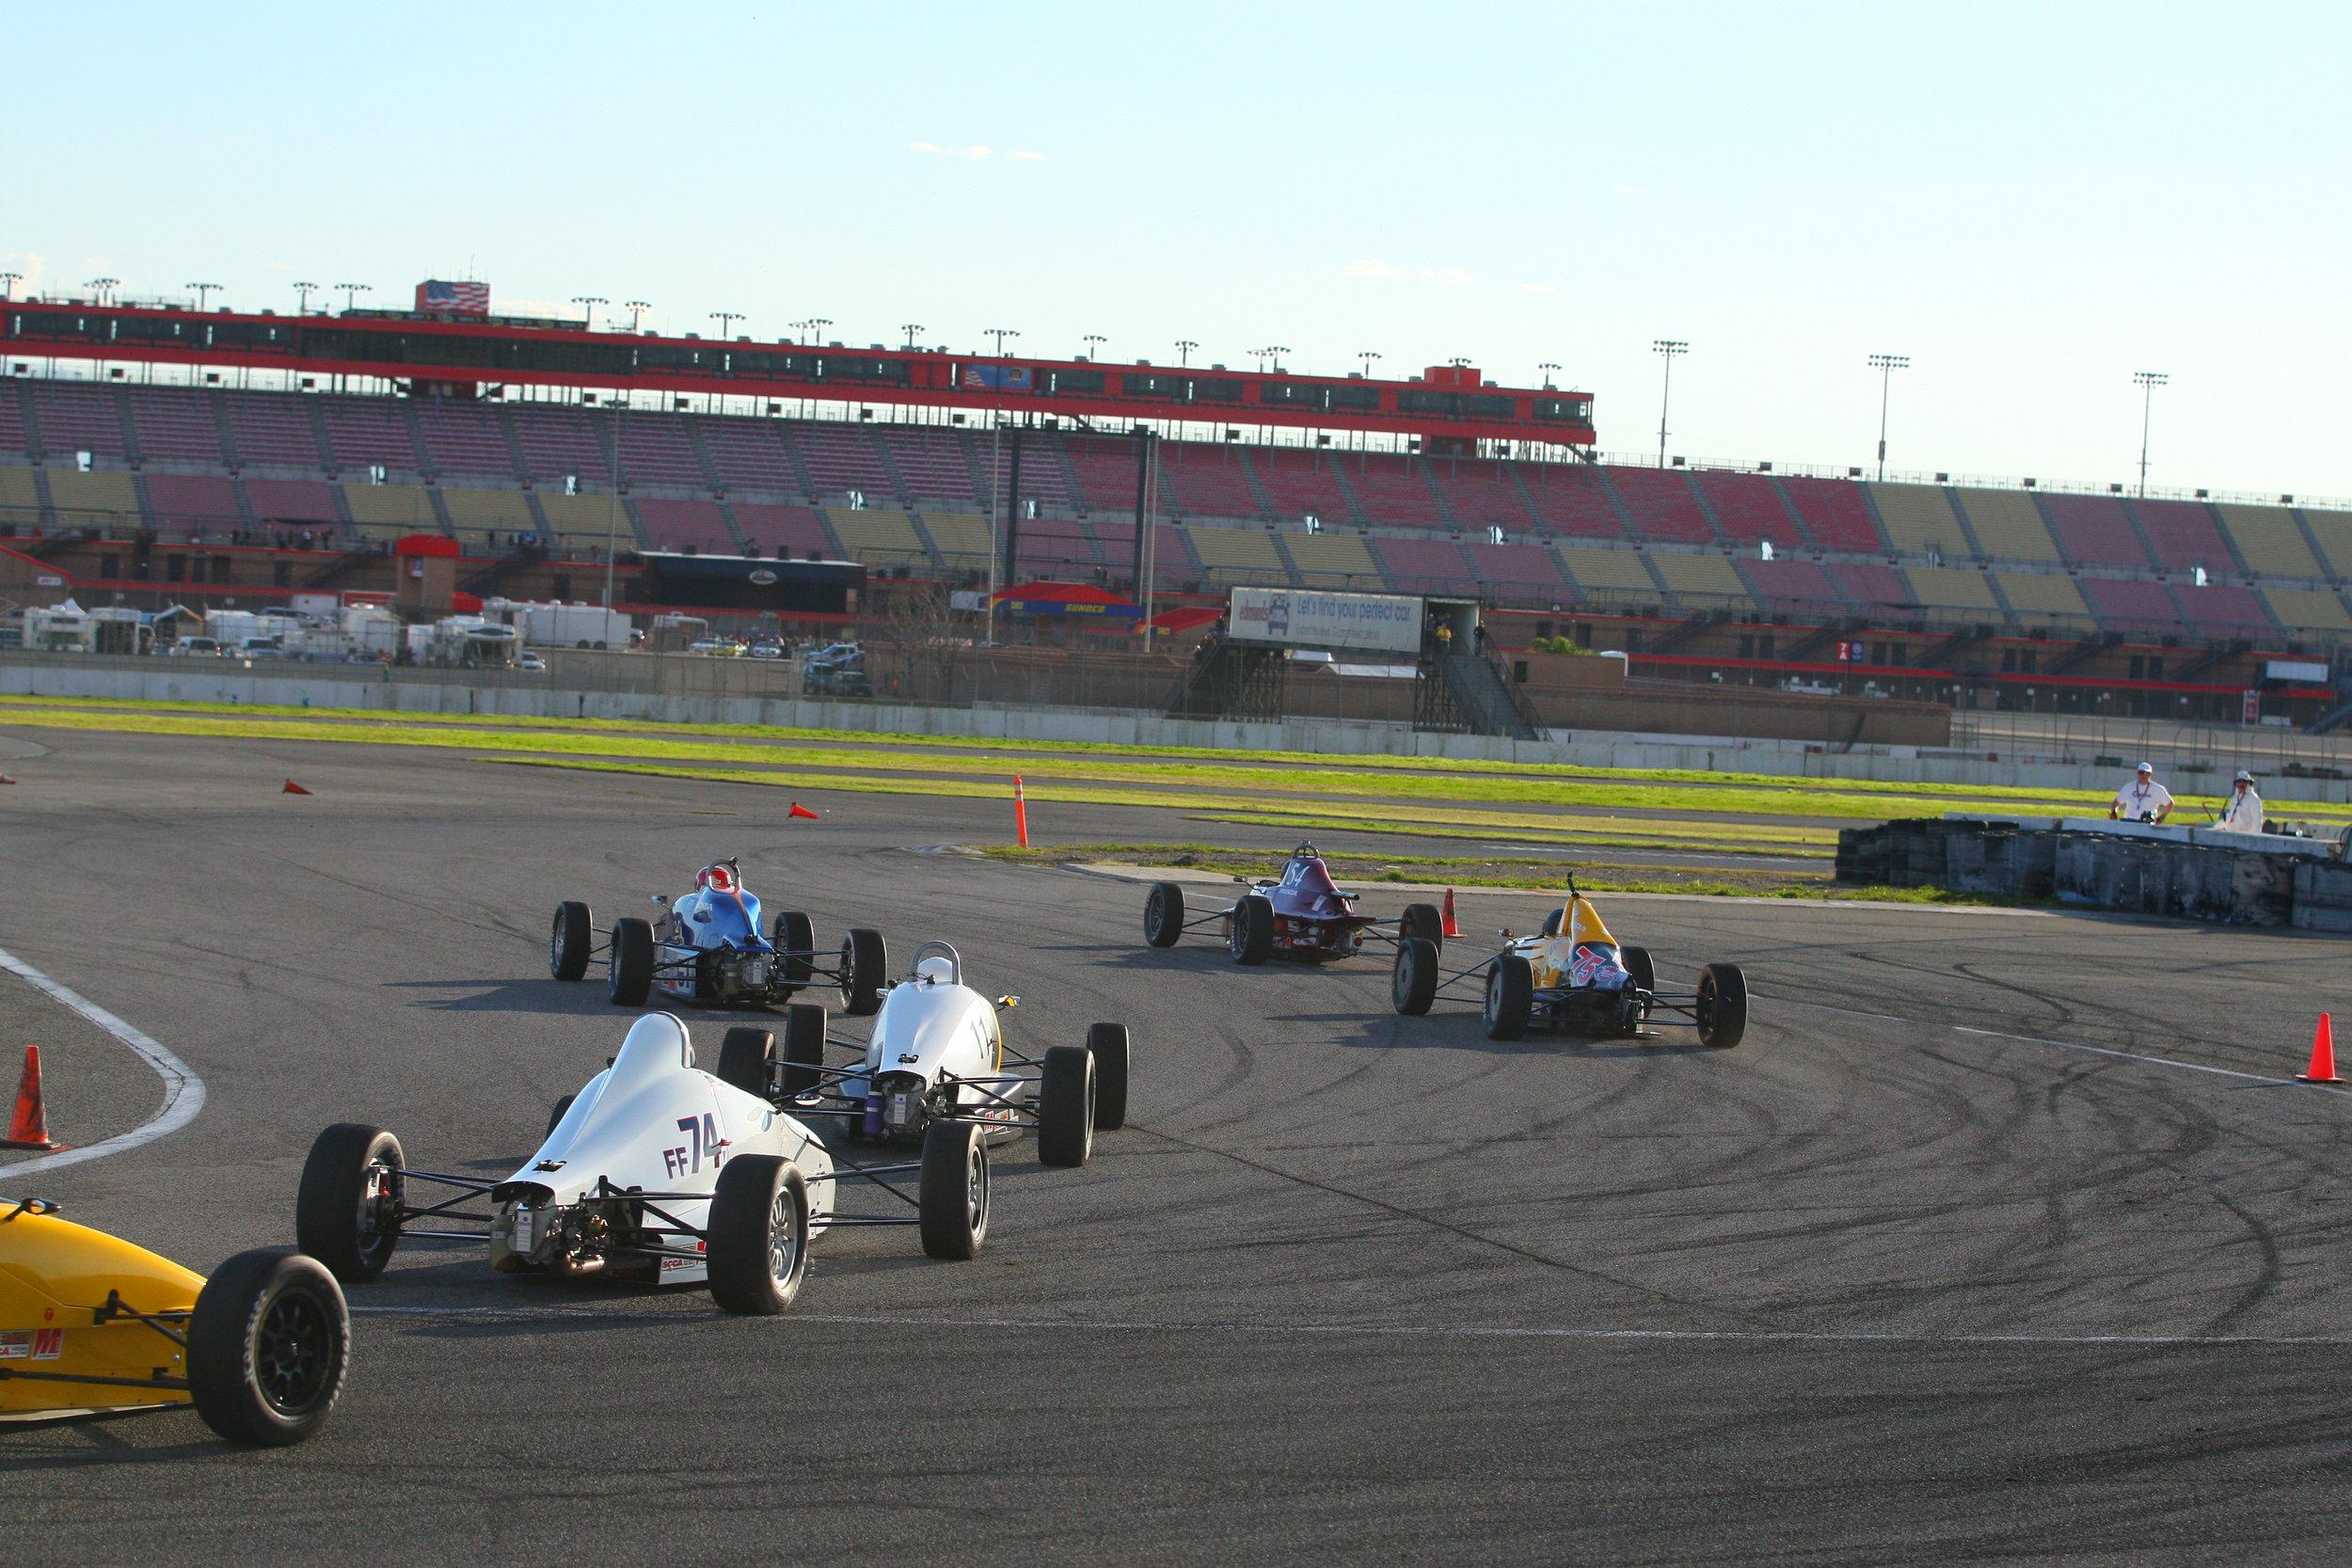 Jan-14-2017-SCCA Majors - Group 6 - Race (Turn 3 Back) - ACS_1382_Jan1417_CaliPhoto.jpg